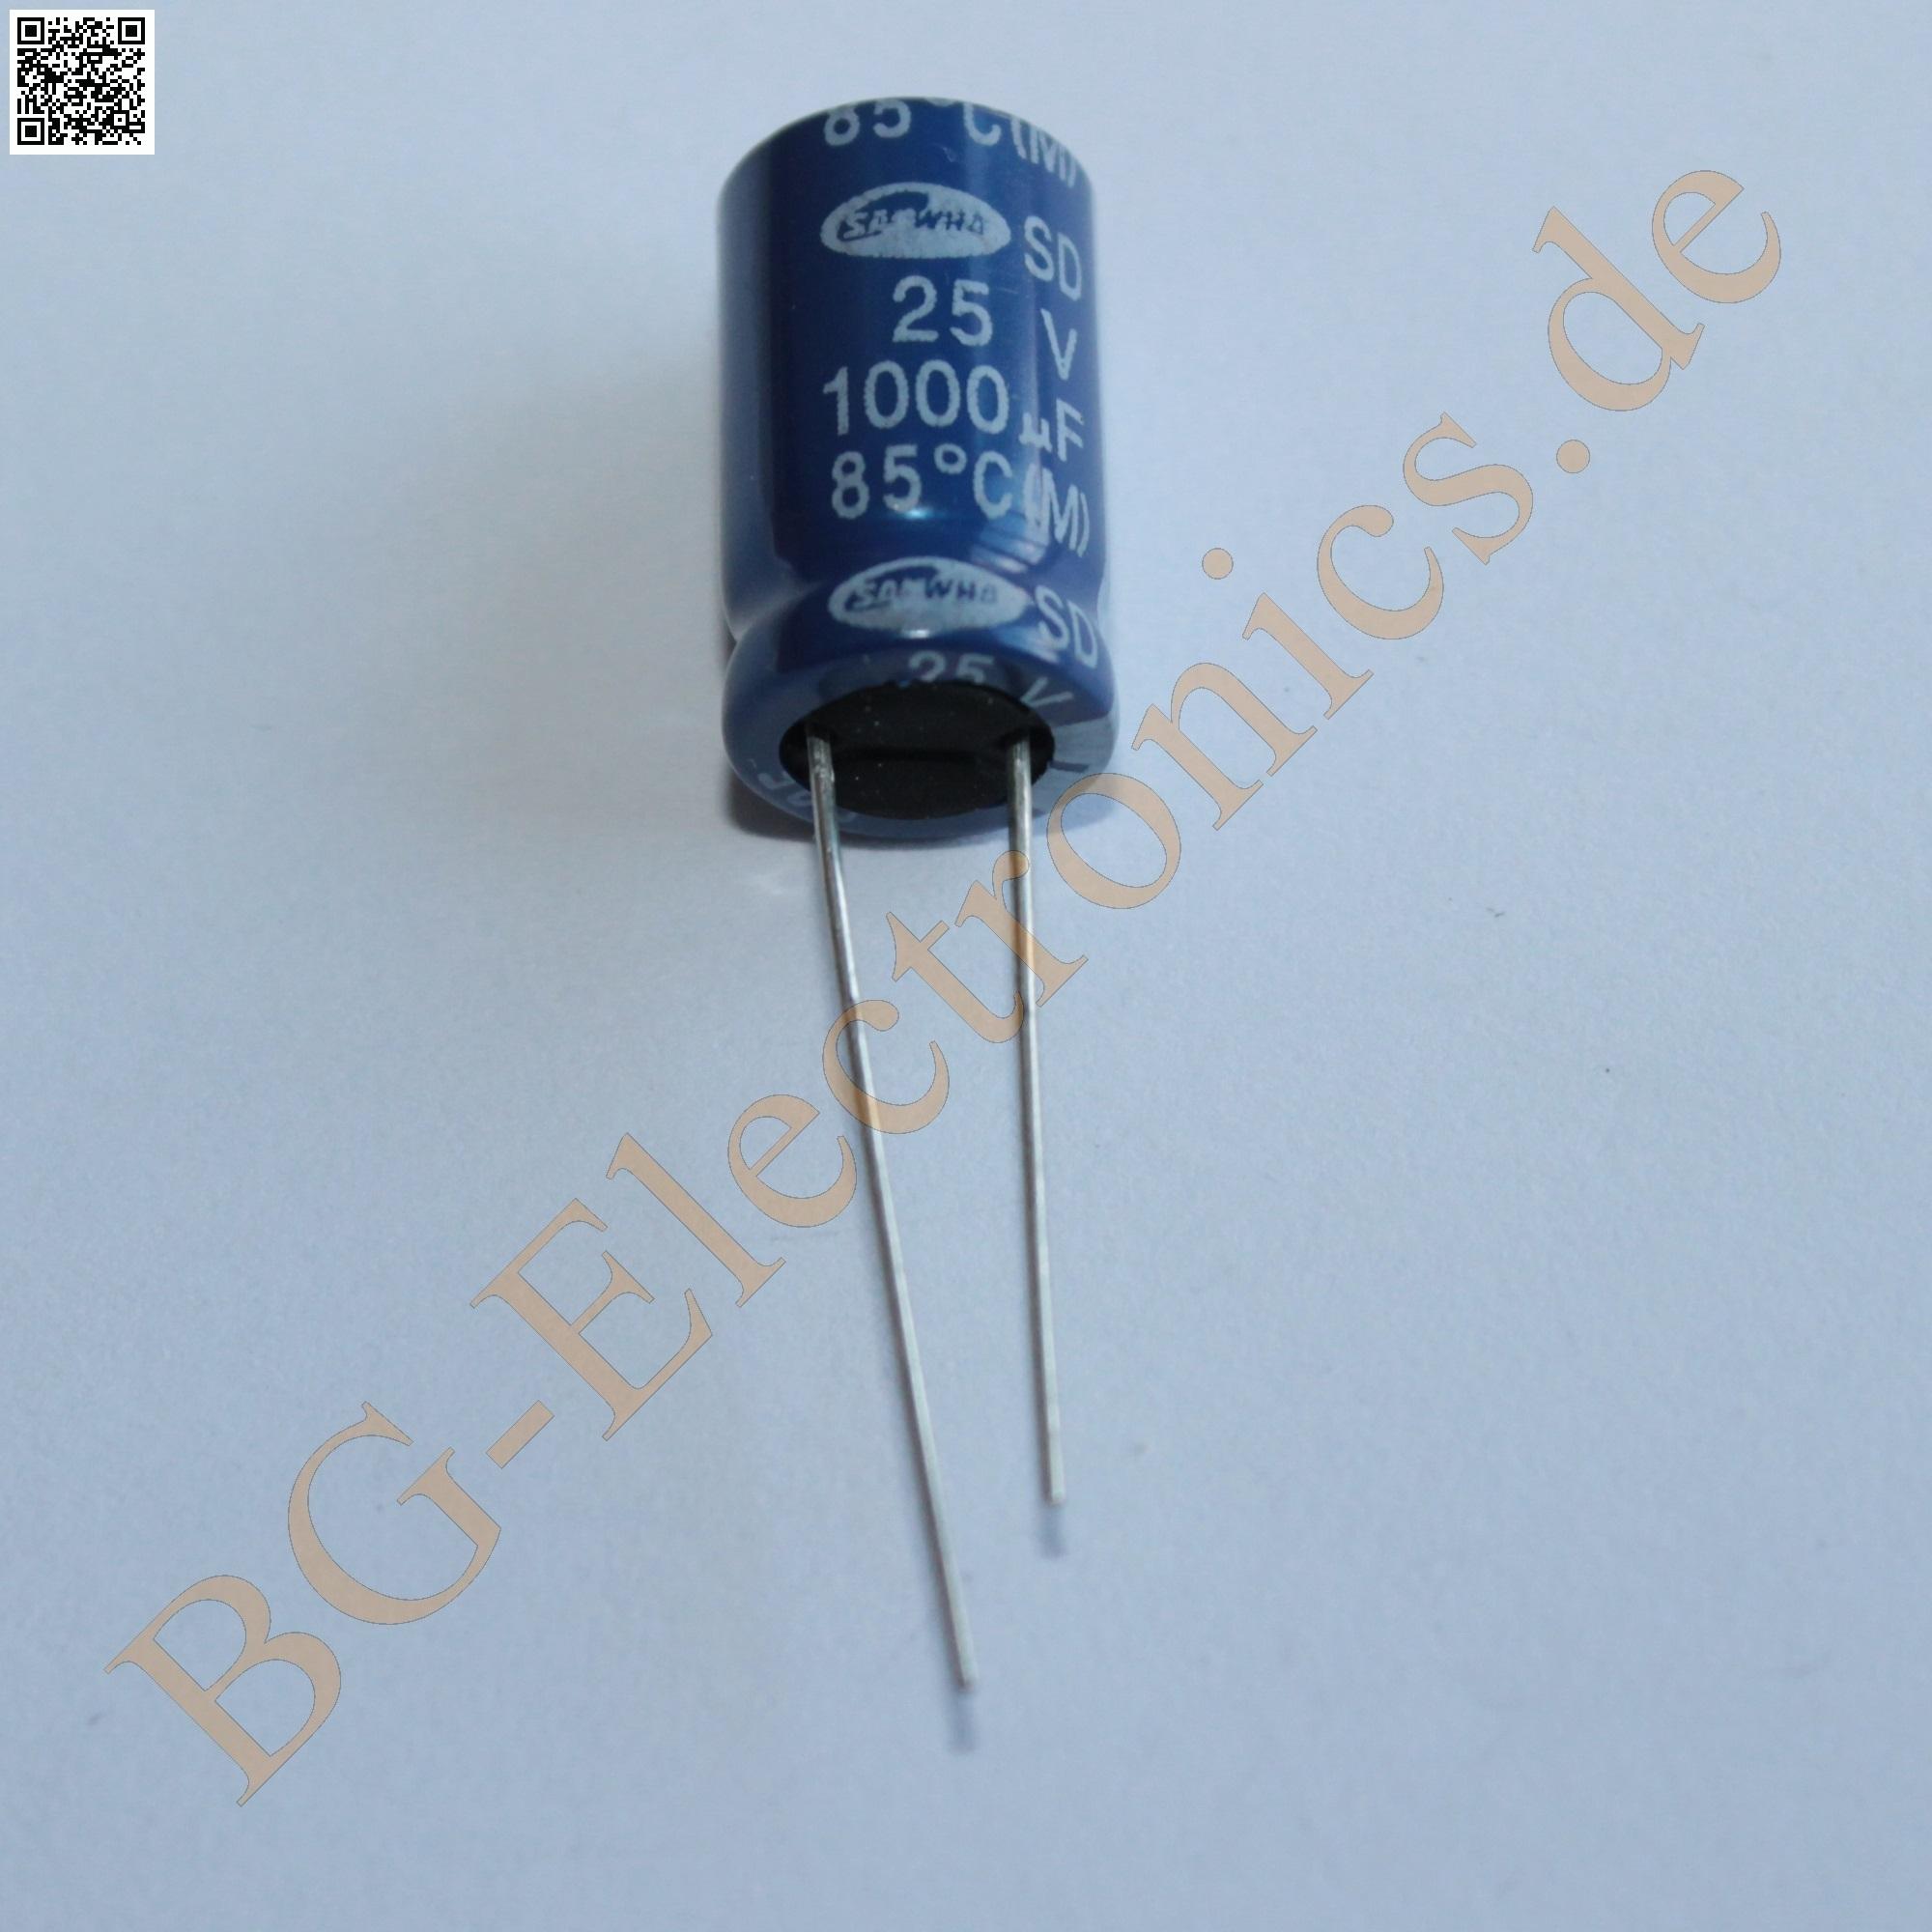 10 radiale Elko capacitors CONDENSATORE 1000µf 16v